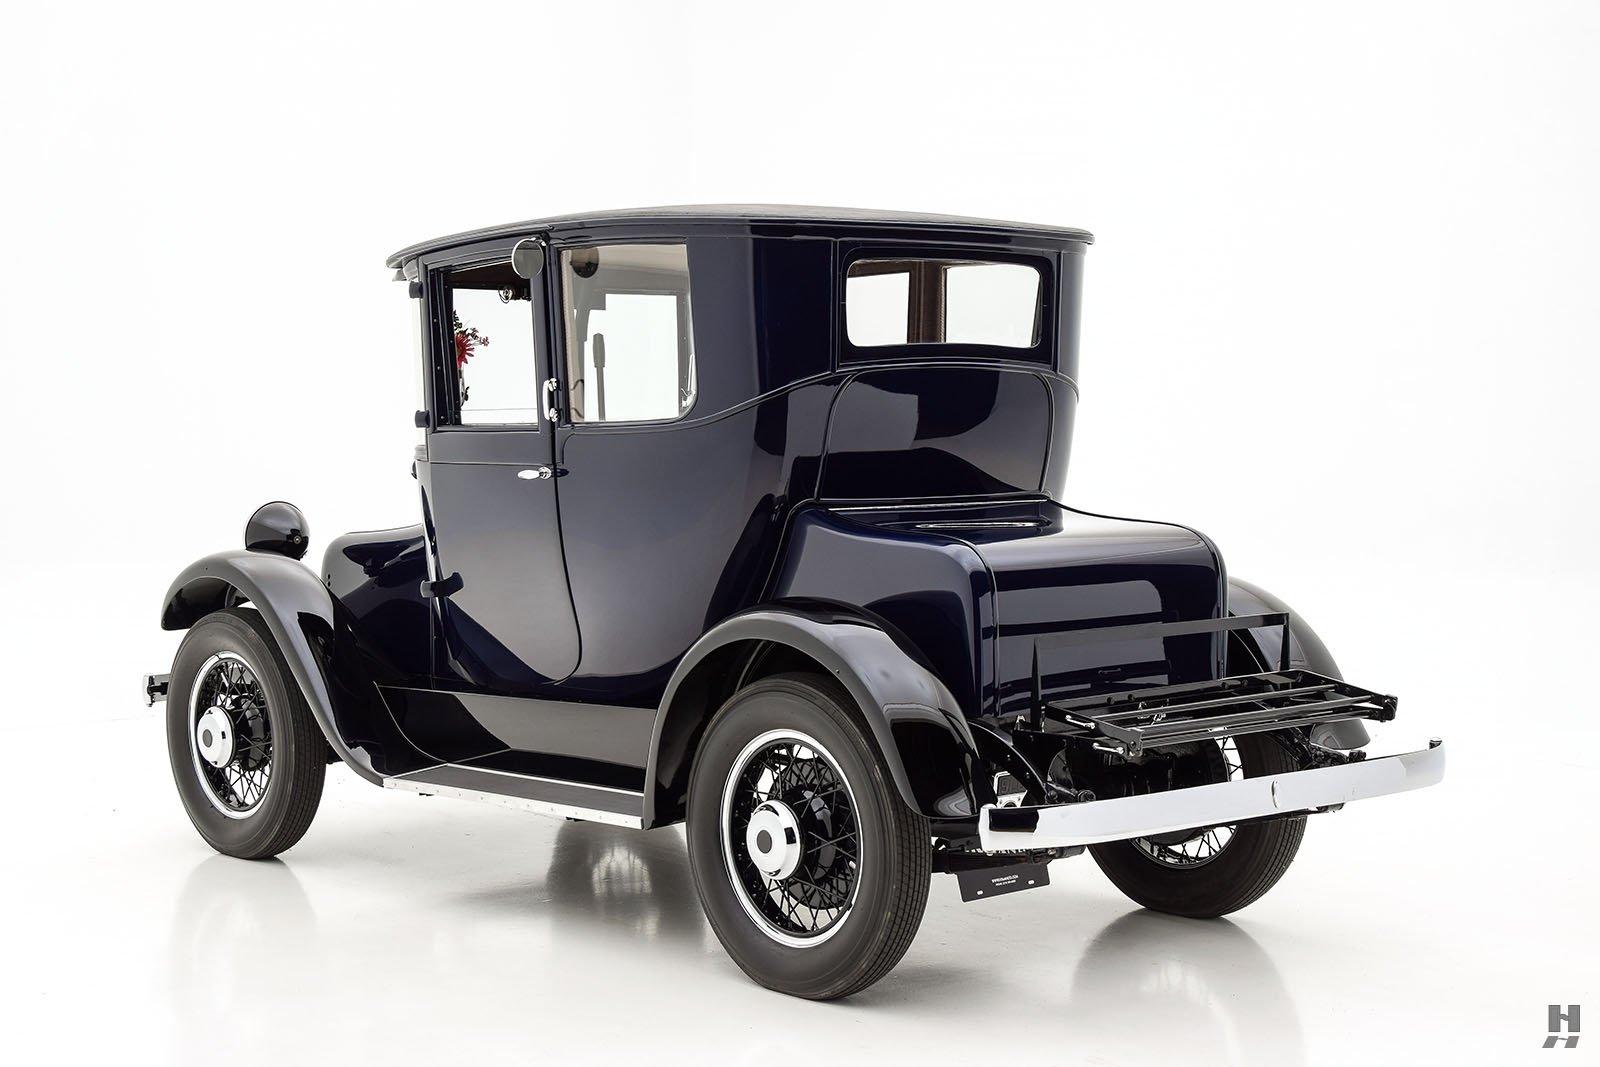 1931 Detroit Electric Model 97 Coupe For Sale   Classic Cars   Hyman LTD